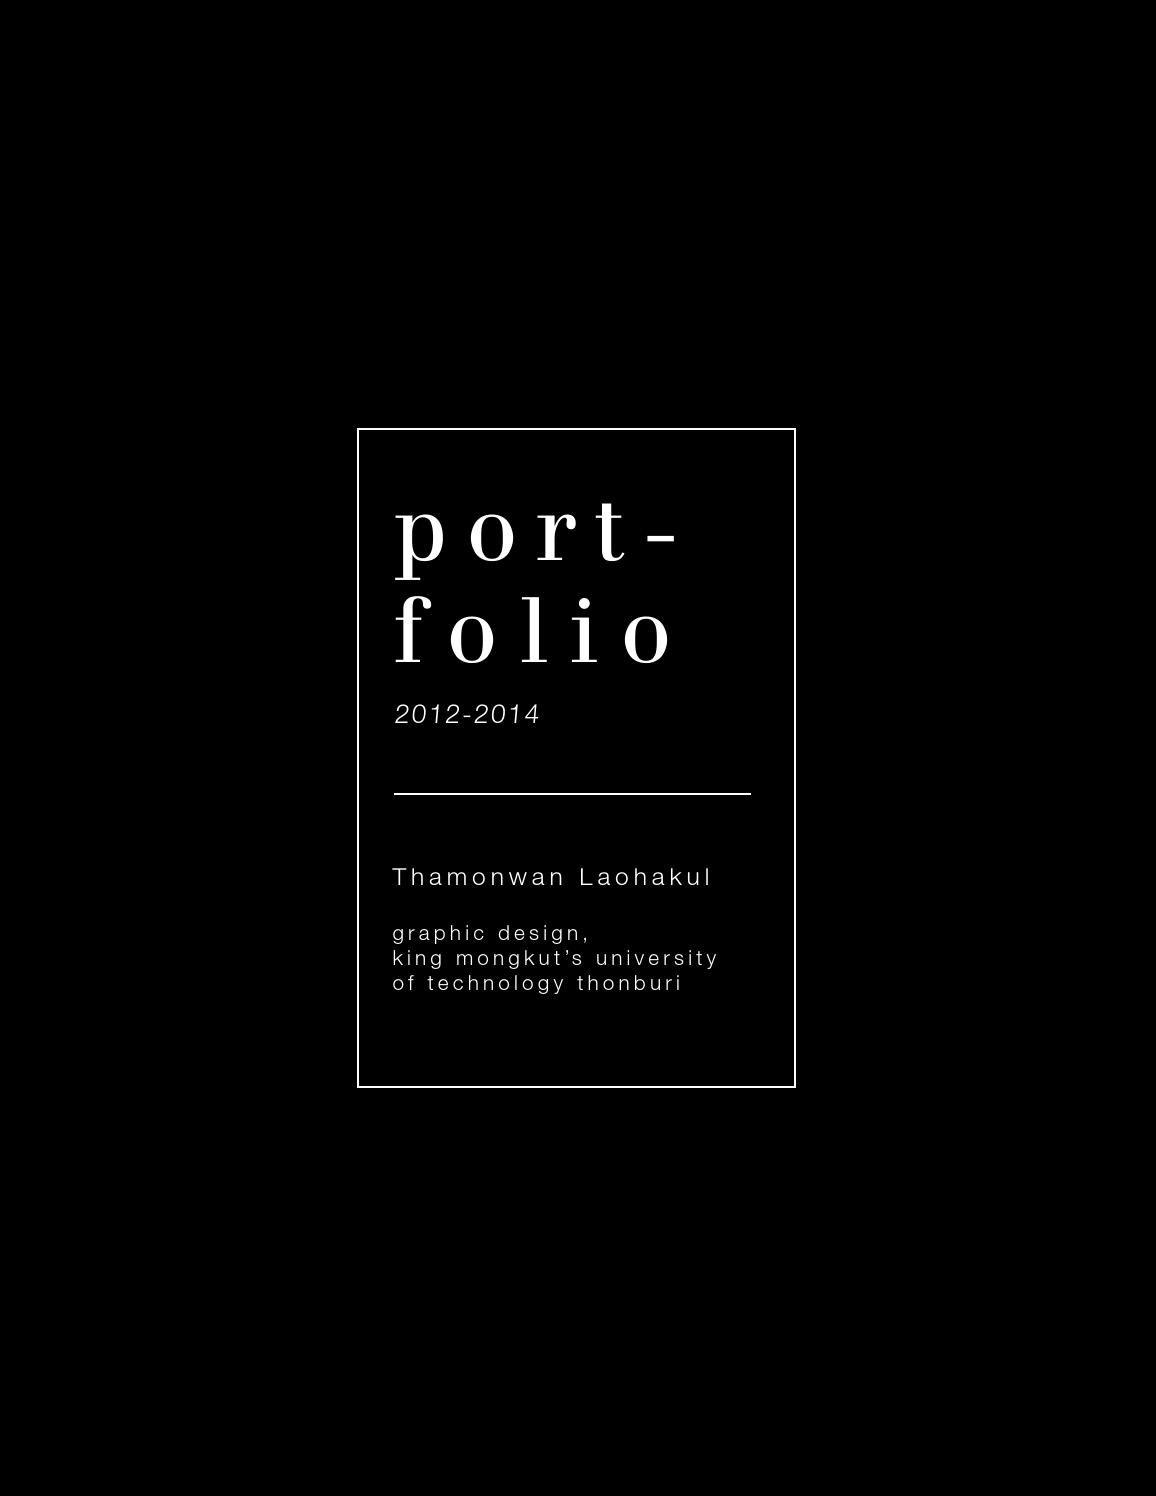 portfolio d architettura iuav typography circles and texts mai s portfolio